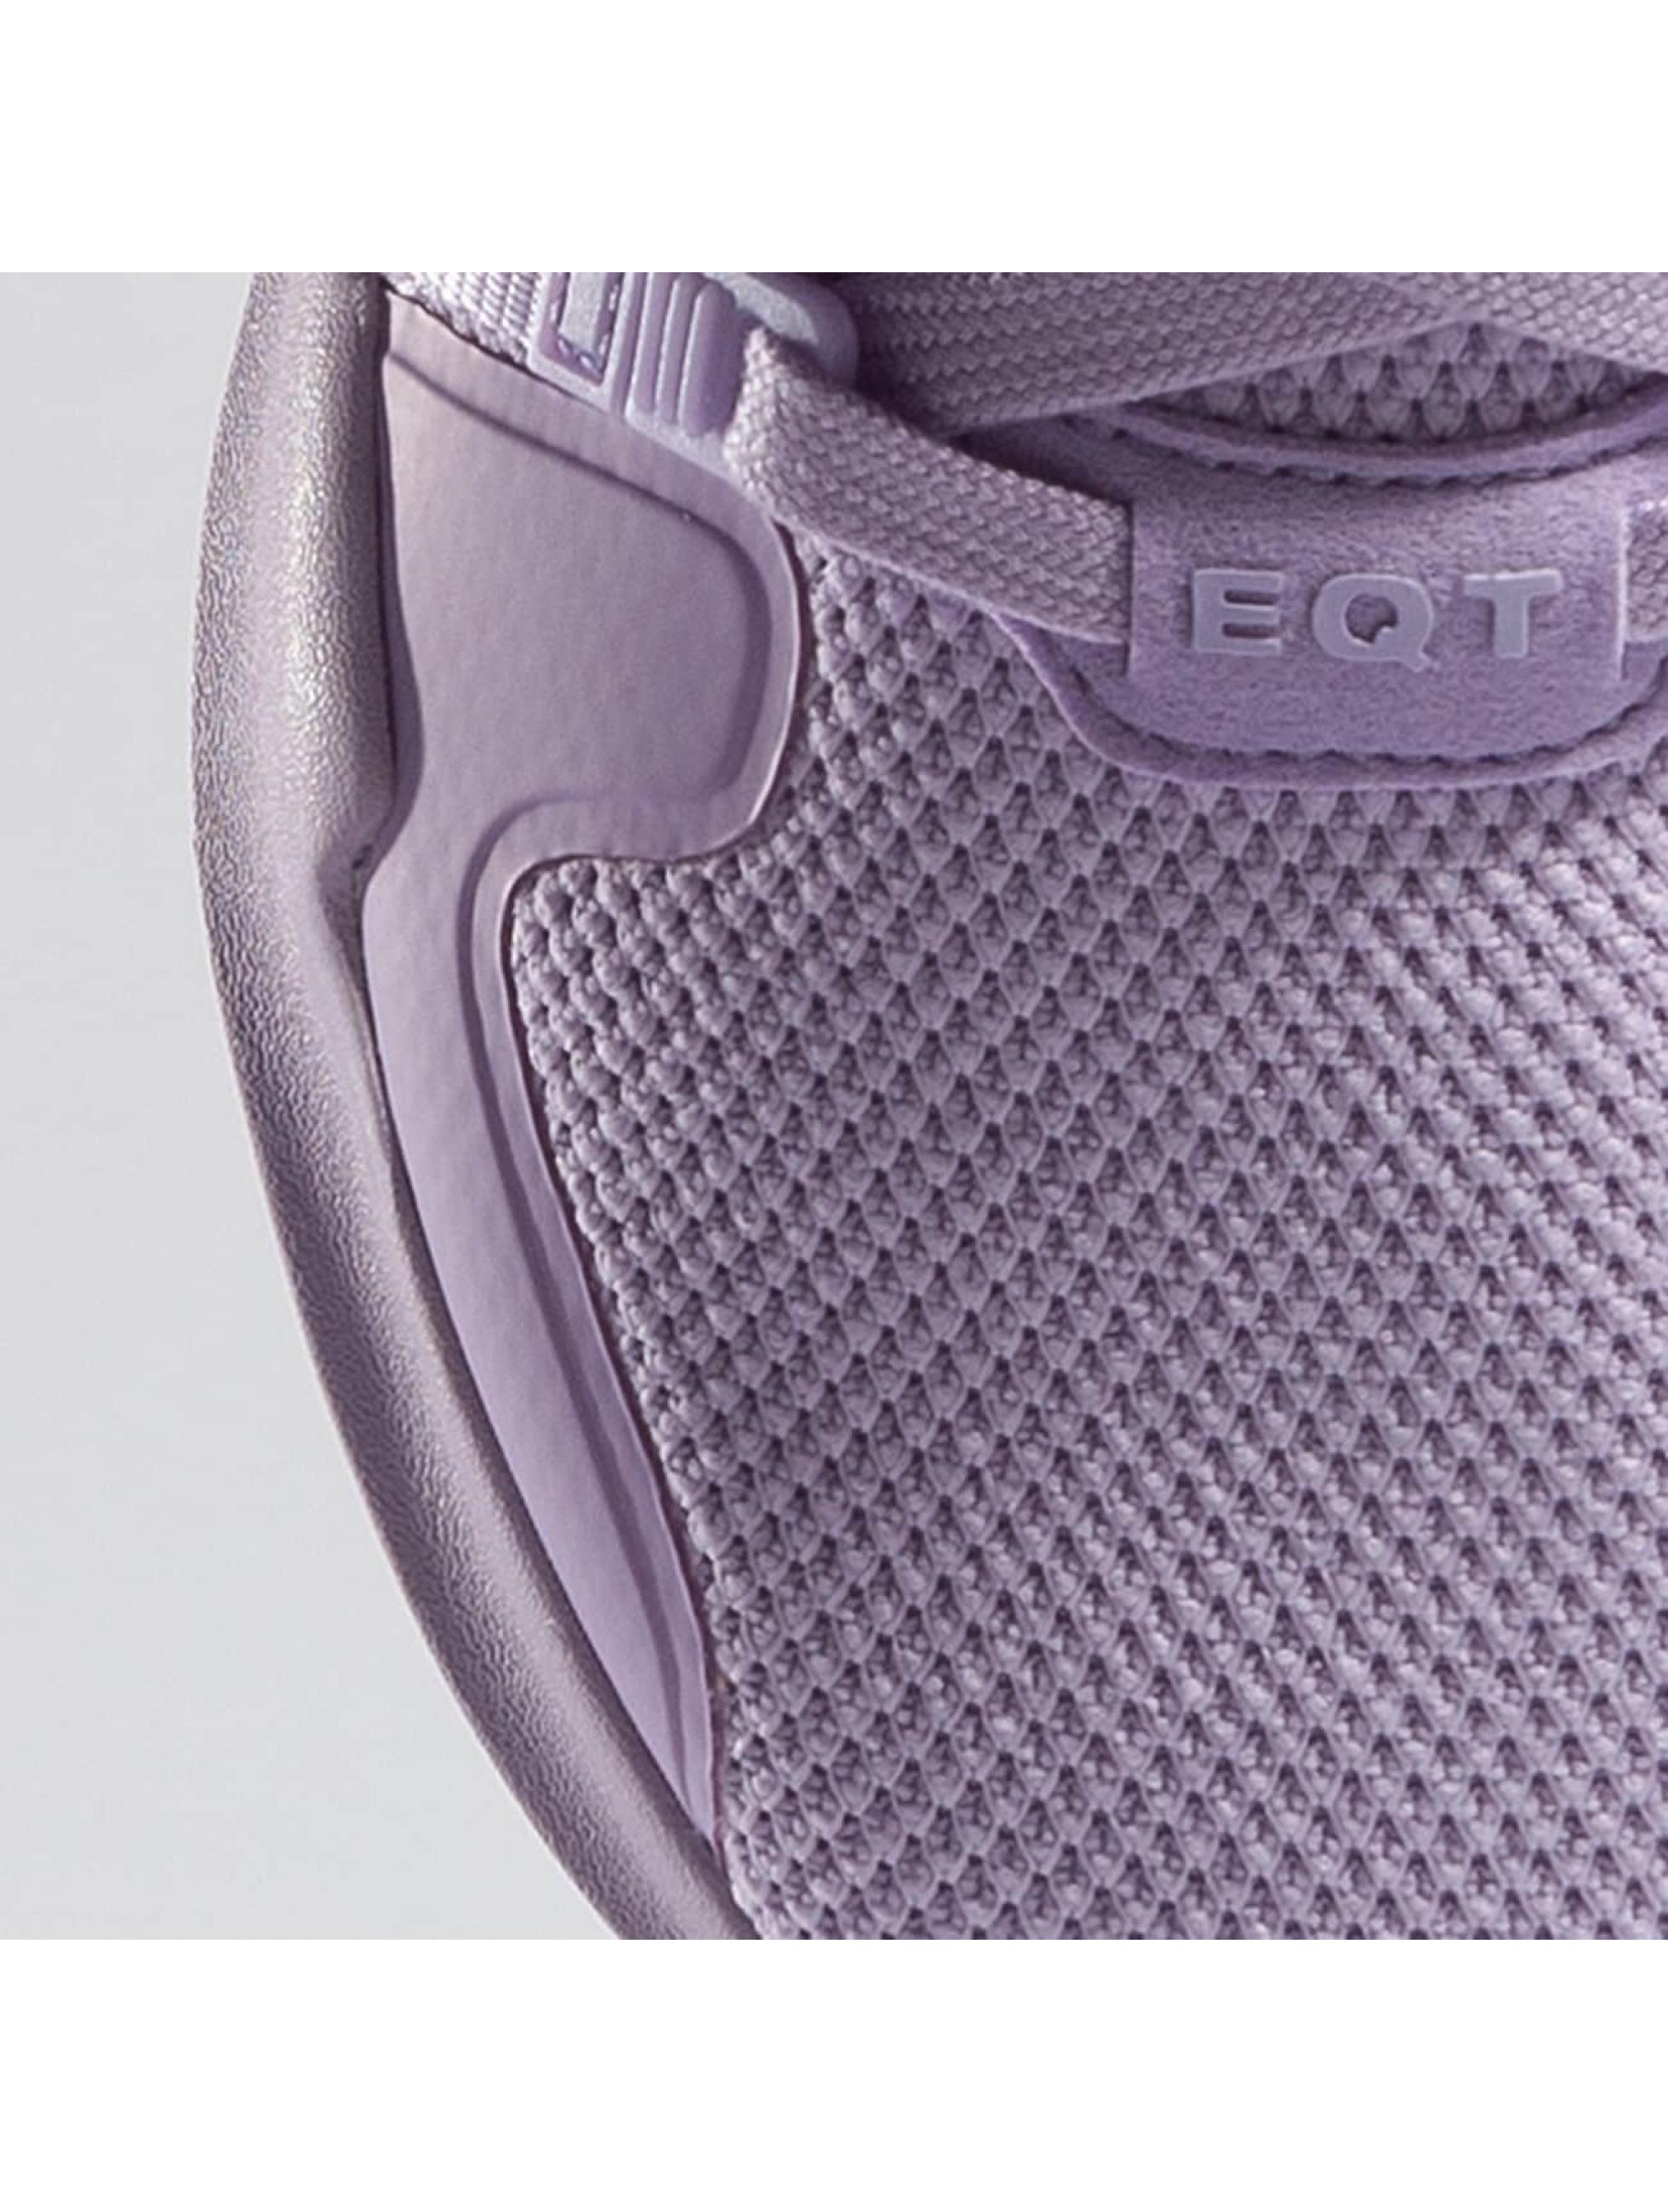 adidas originals Zapatillas de deporte Equipment Support ADV púrpura